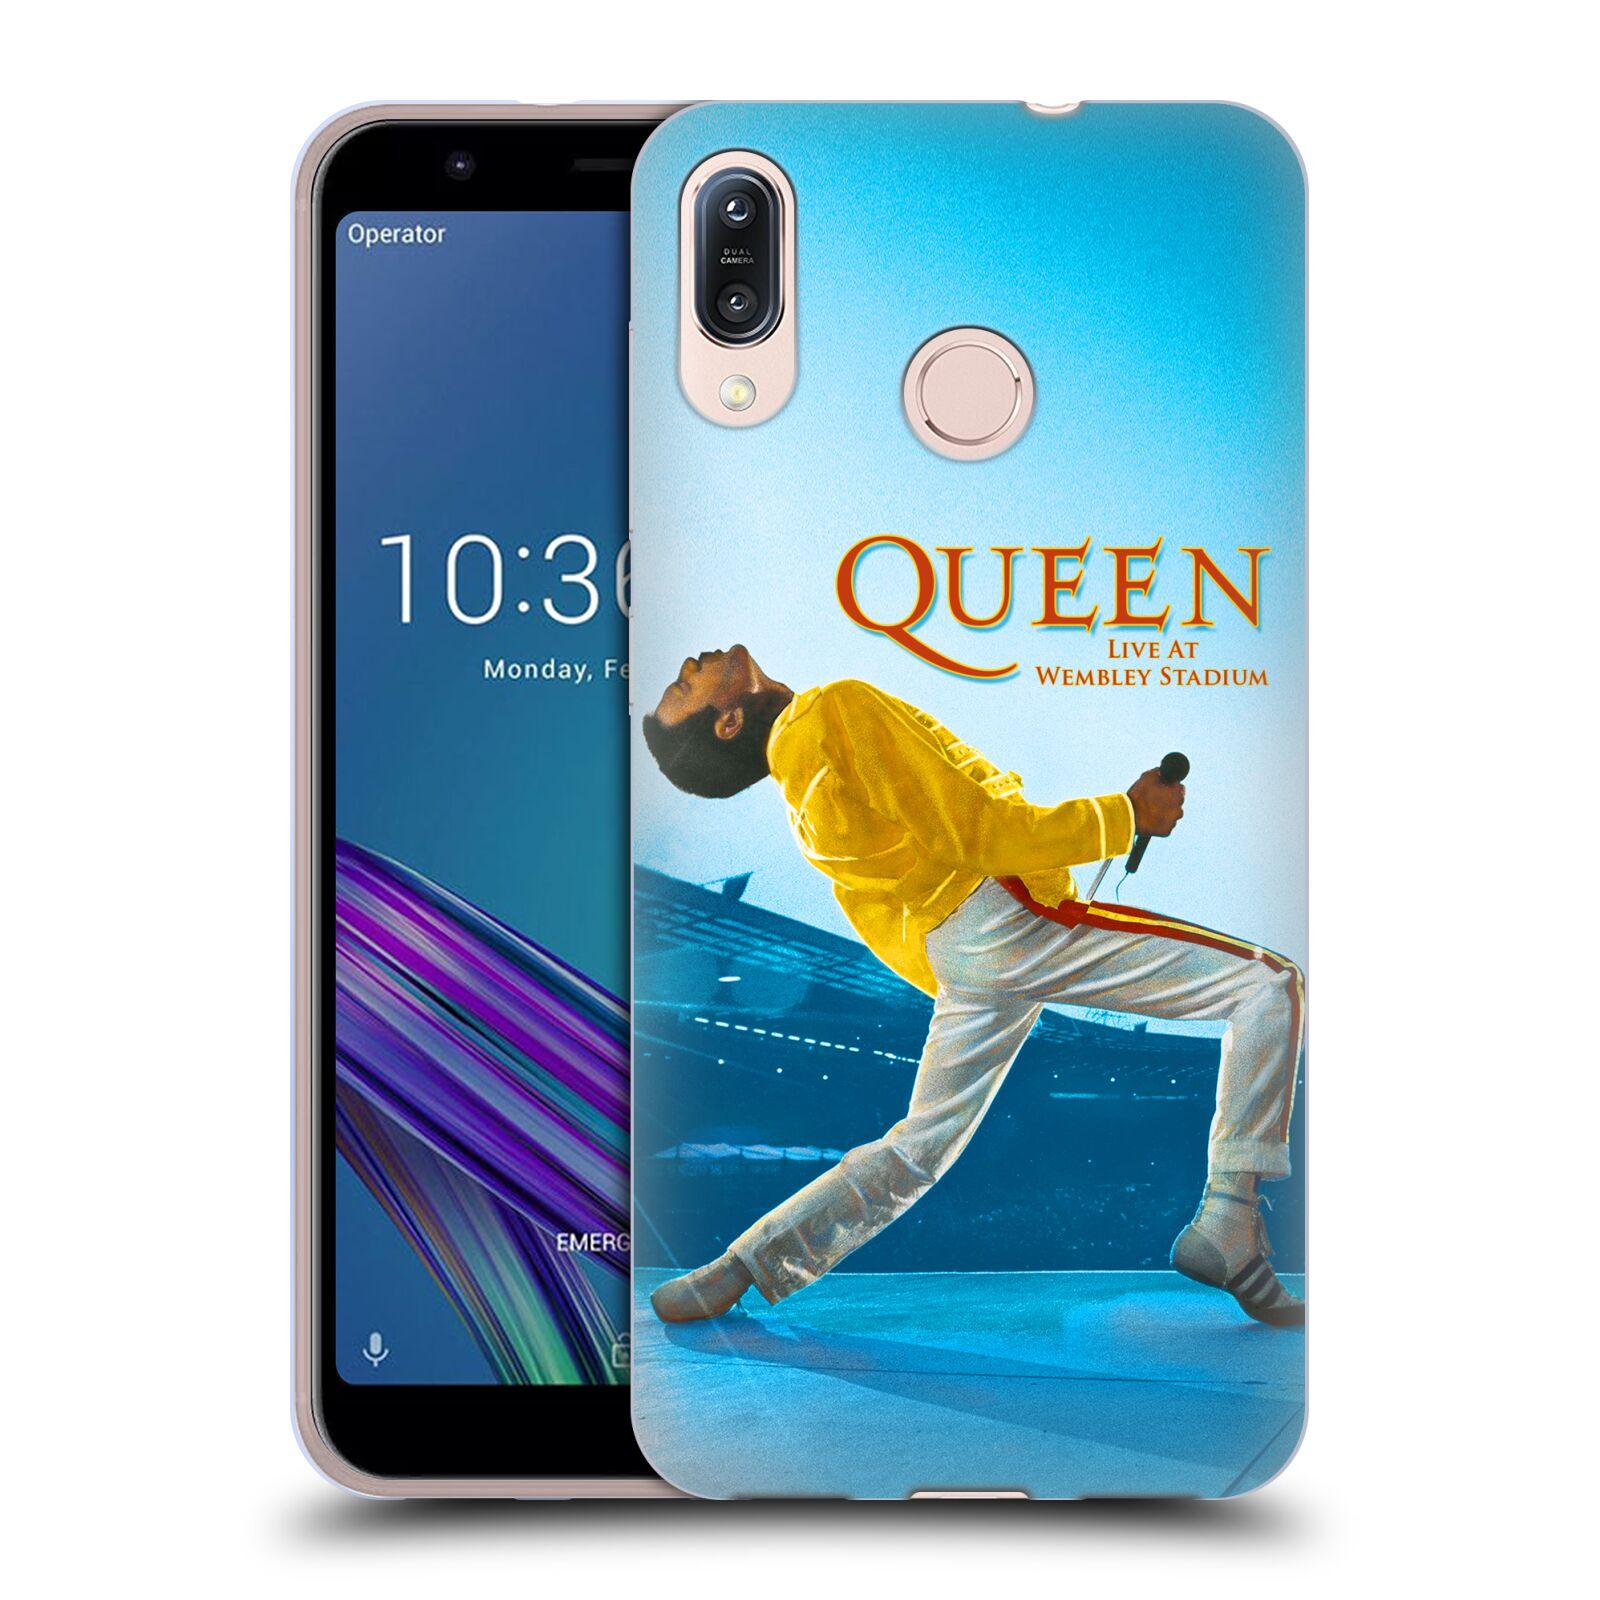 Silikonové pouzdro na mobil Asus Zenfone Max M1 ZB555KL - Head Case - Queen - Freddie Mercury